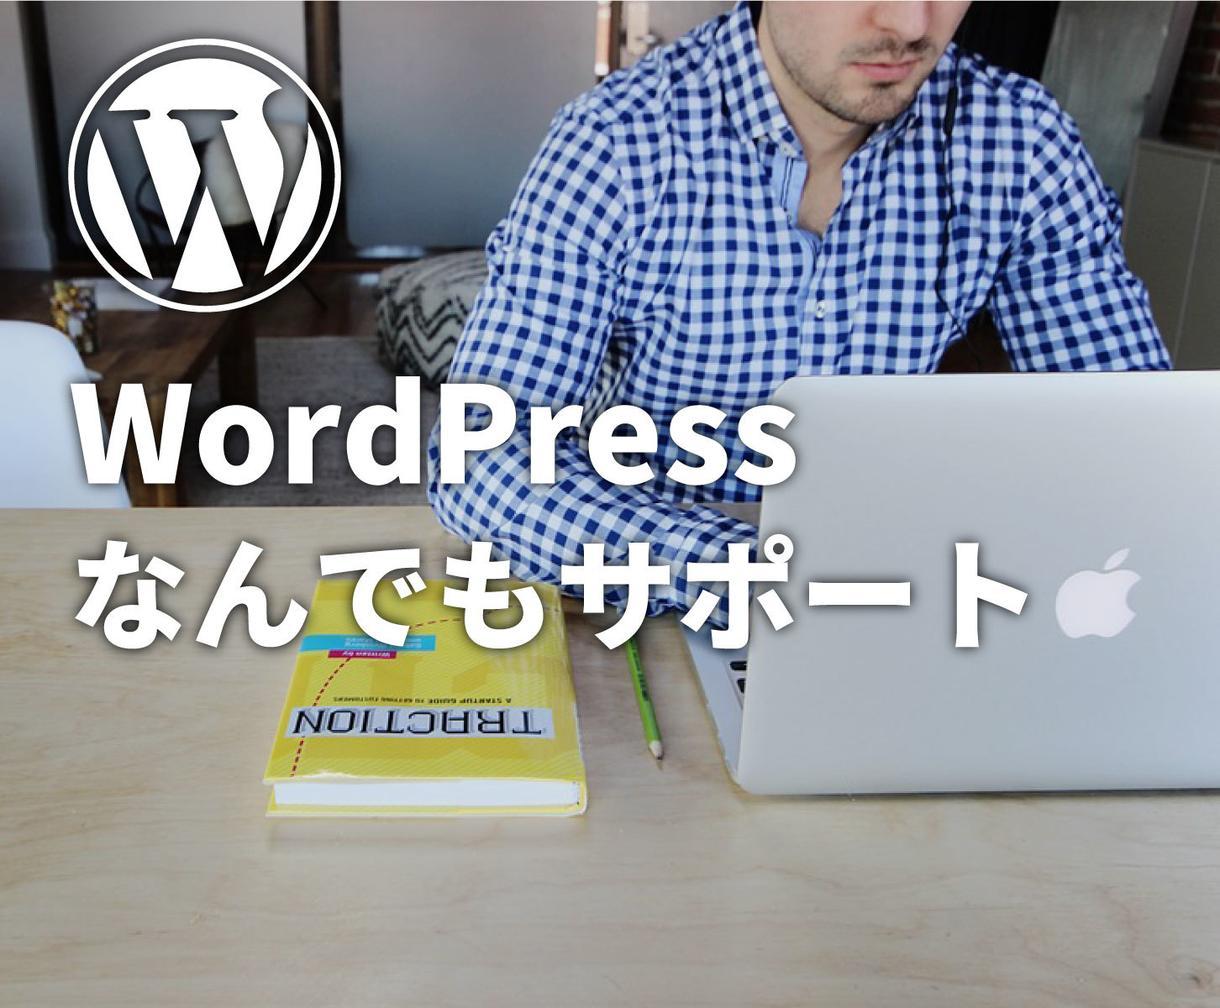 WordPressの質問や相談・問題解決をします エラー解決/デザイン変更/機能追加など何でもおまかせ!